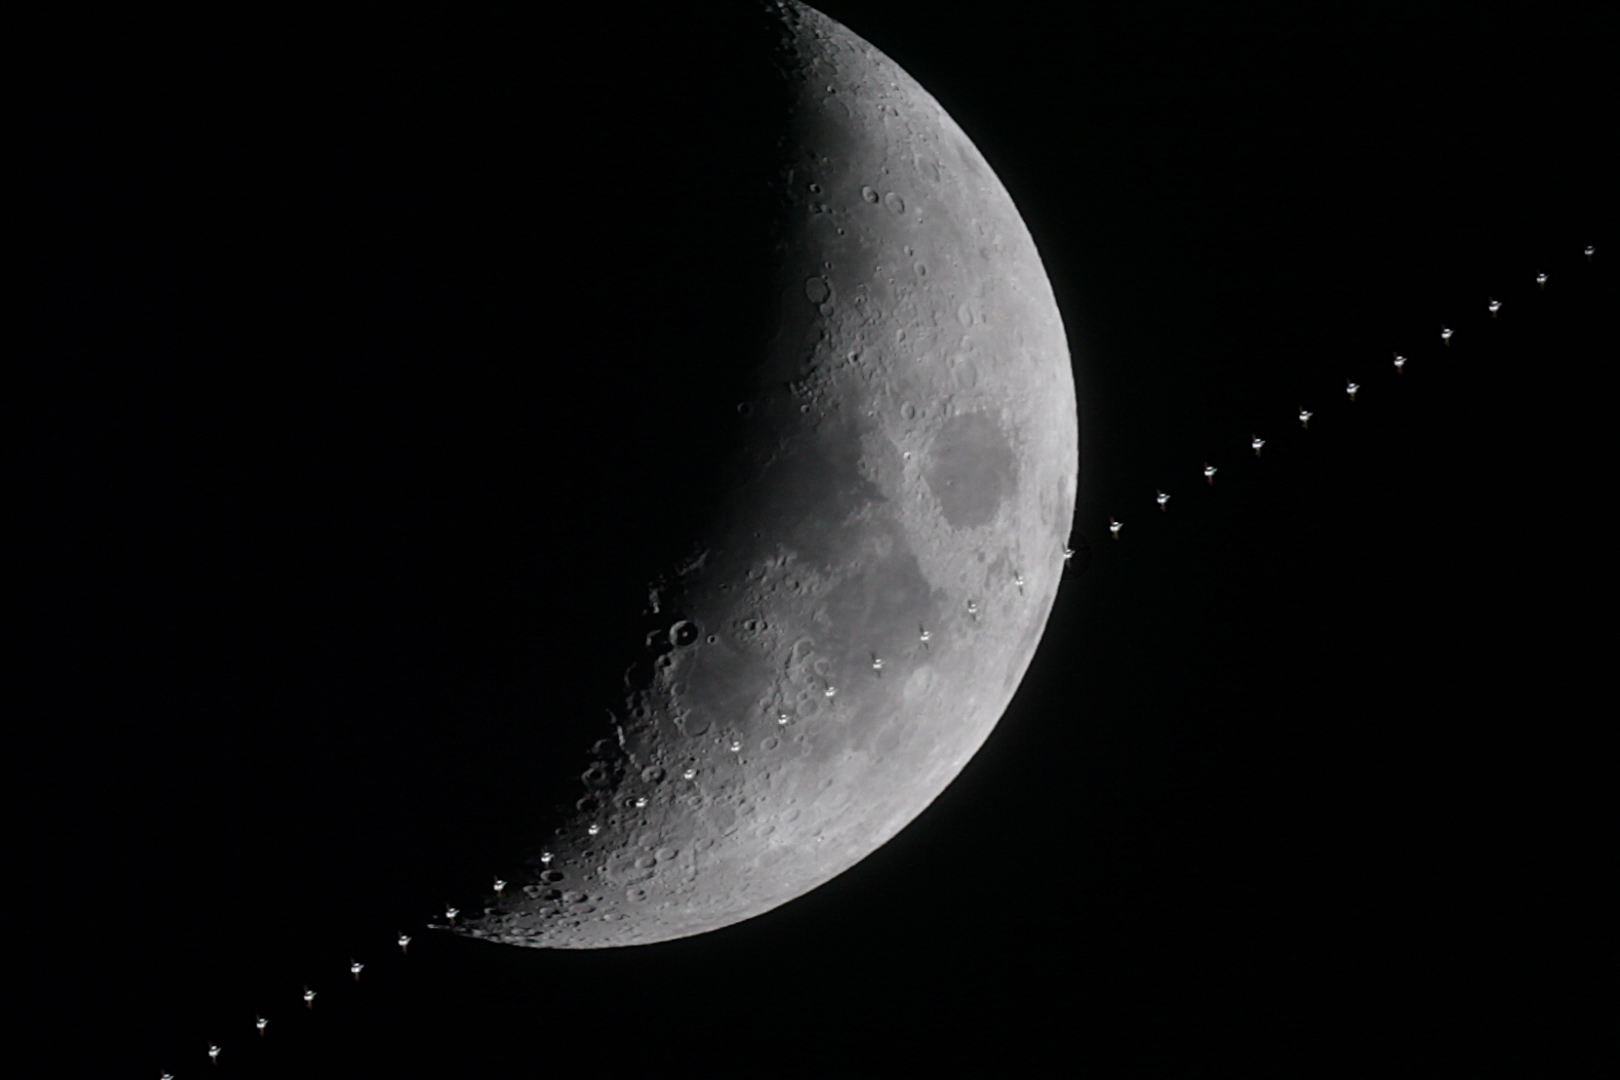 http://www.ncsm.city.nagoya.jp/study/astro/20150224_iss_moon.jpg